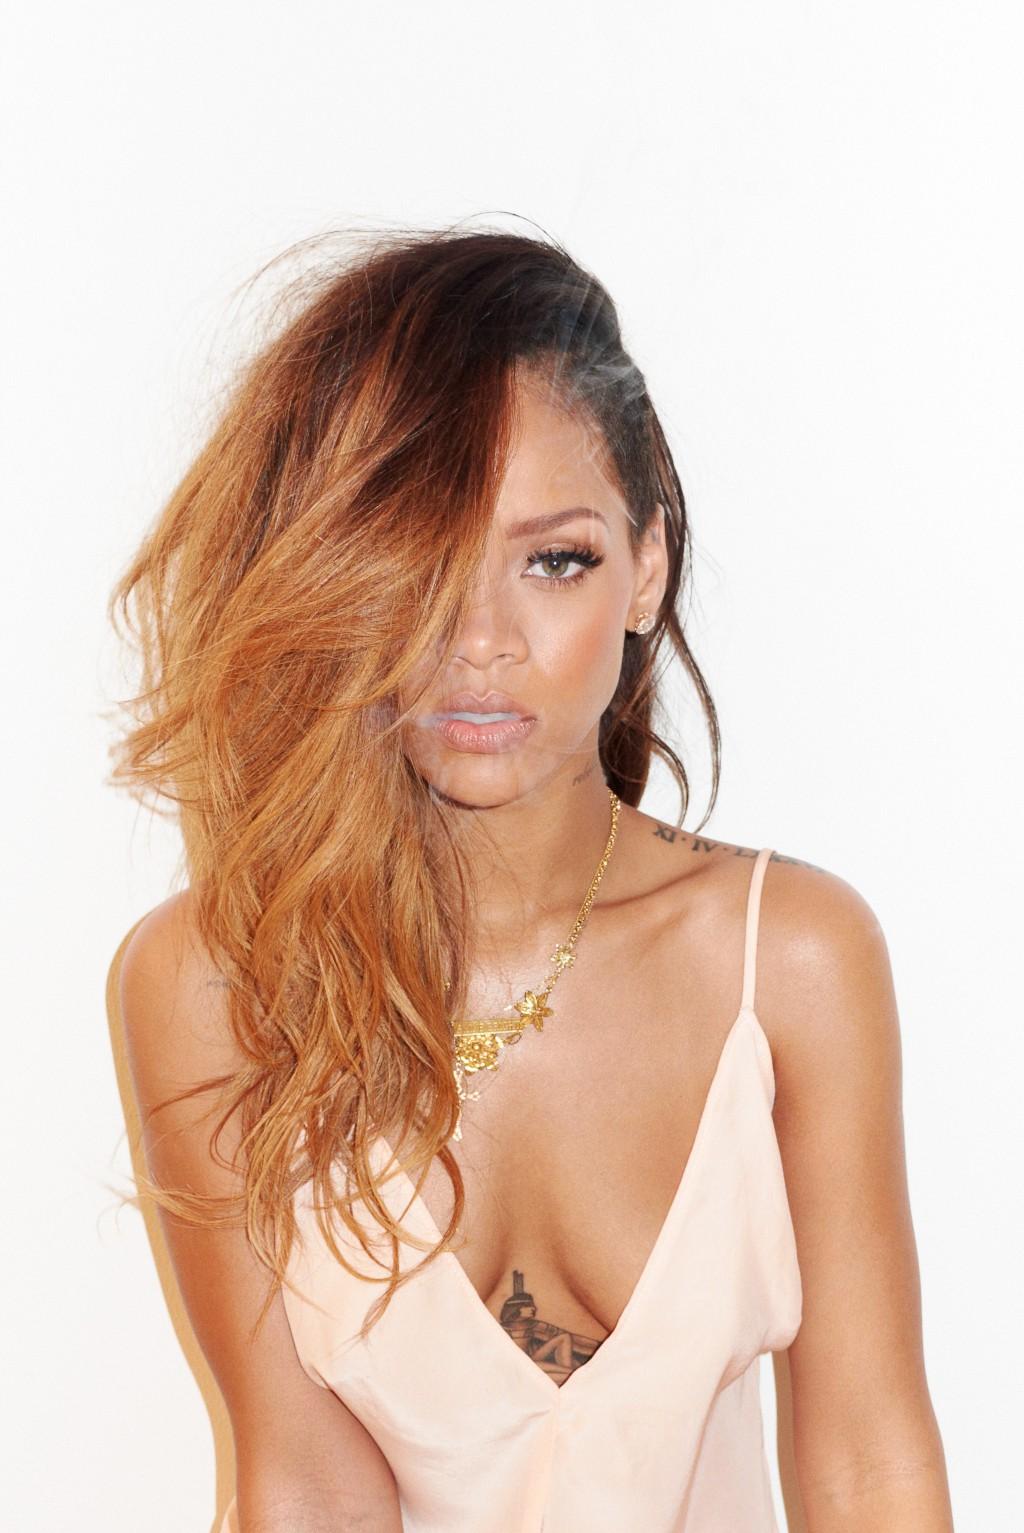 http://1.bp.blogspot.com/-6uQnwo-YcpQ/URCfuy6KHYI/AAAAAAABY8g/cLaylZ7Isn8/s1600/Rihanna-magazine-photo-shoot-20133.jpg